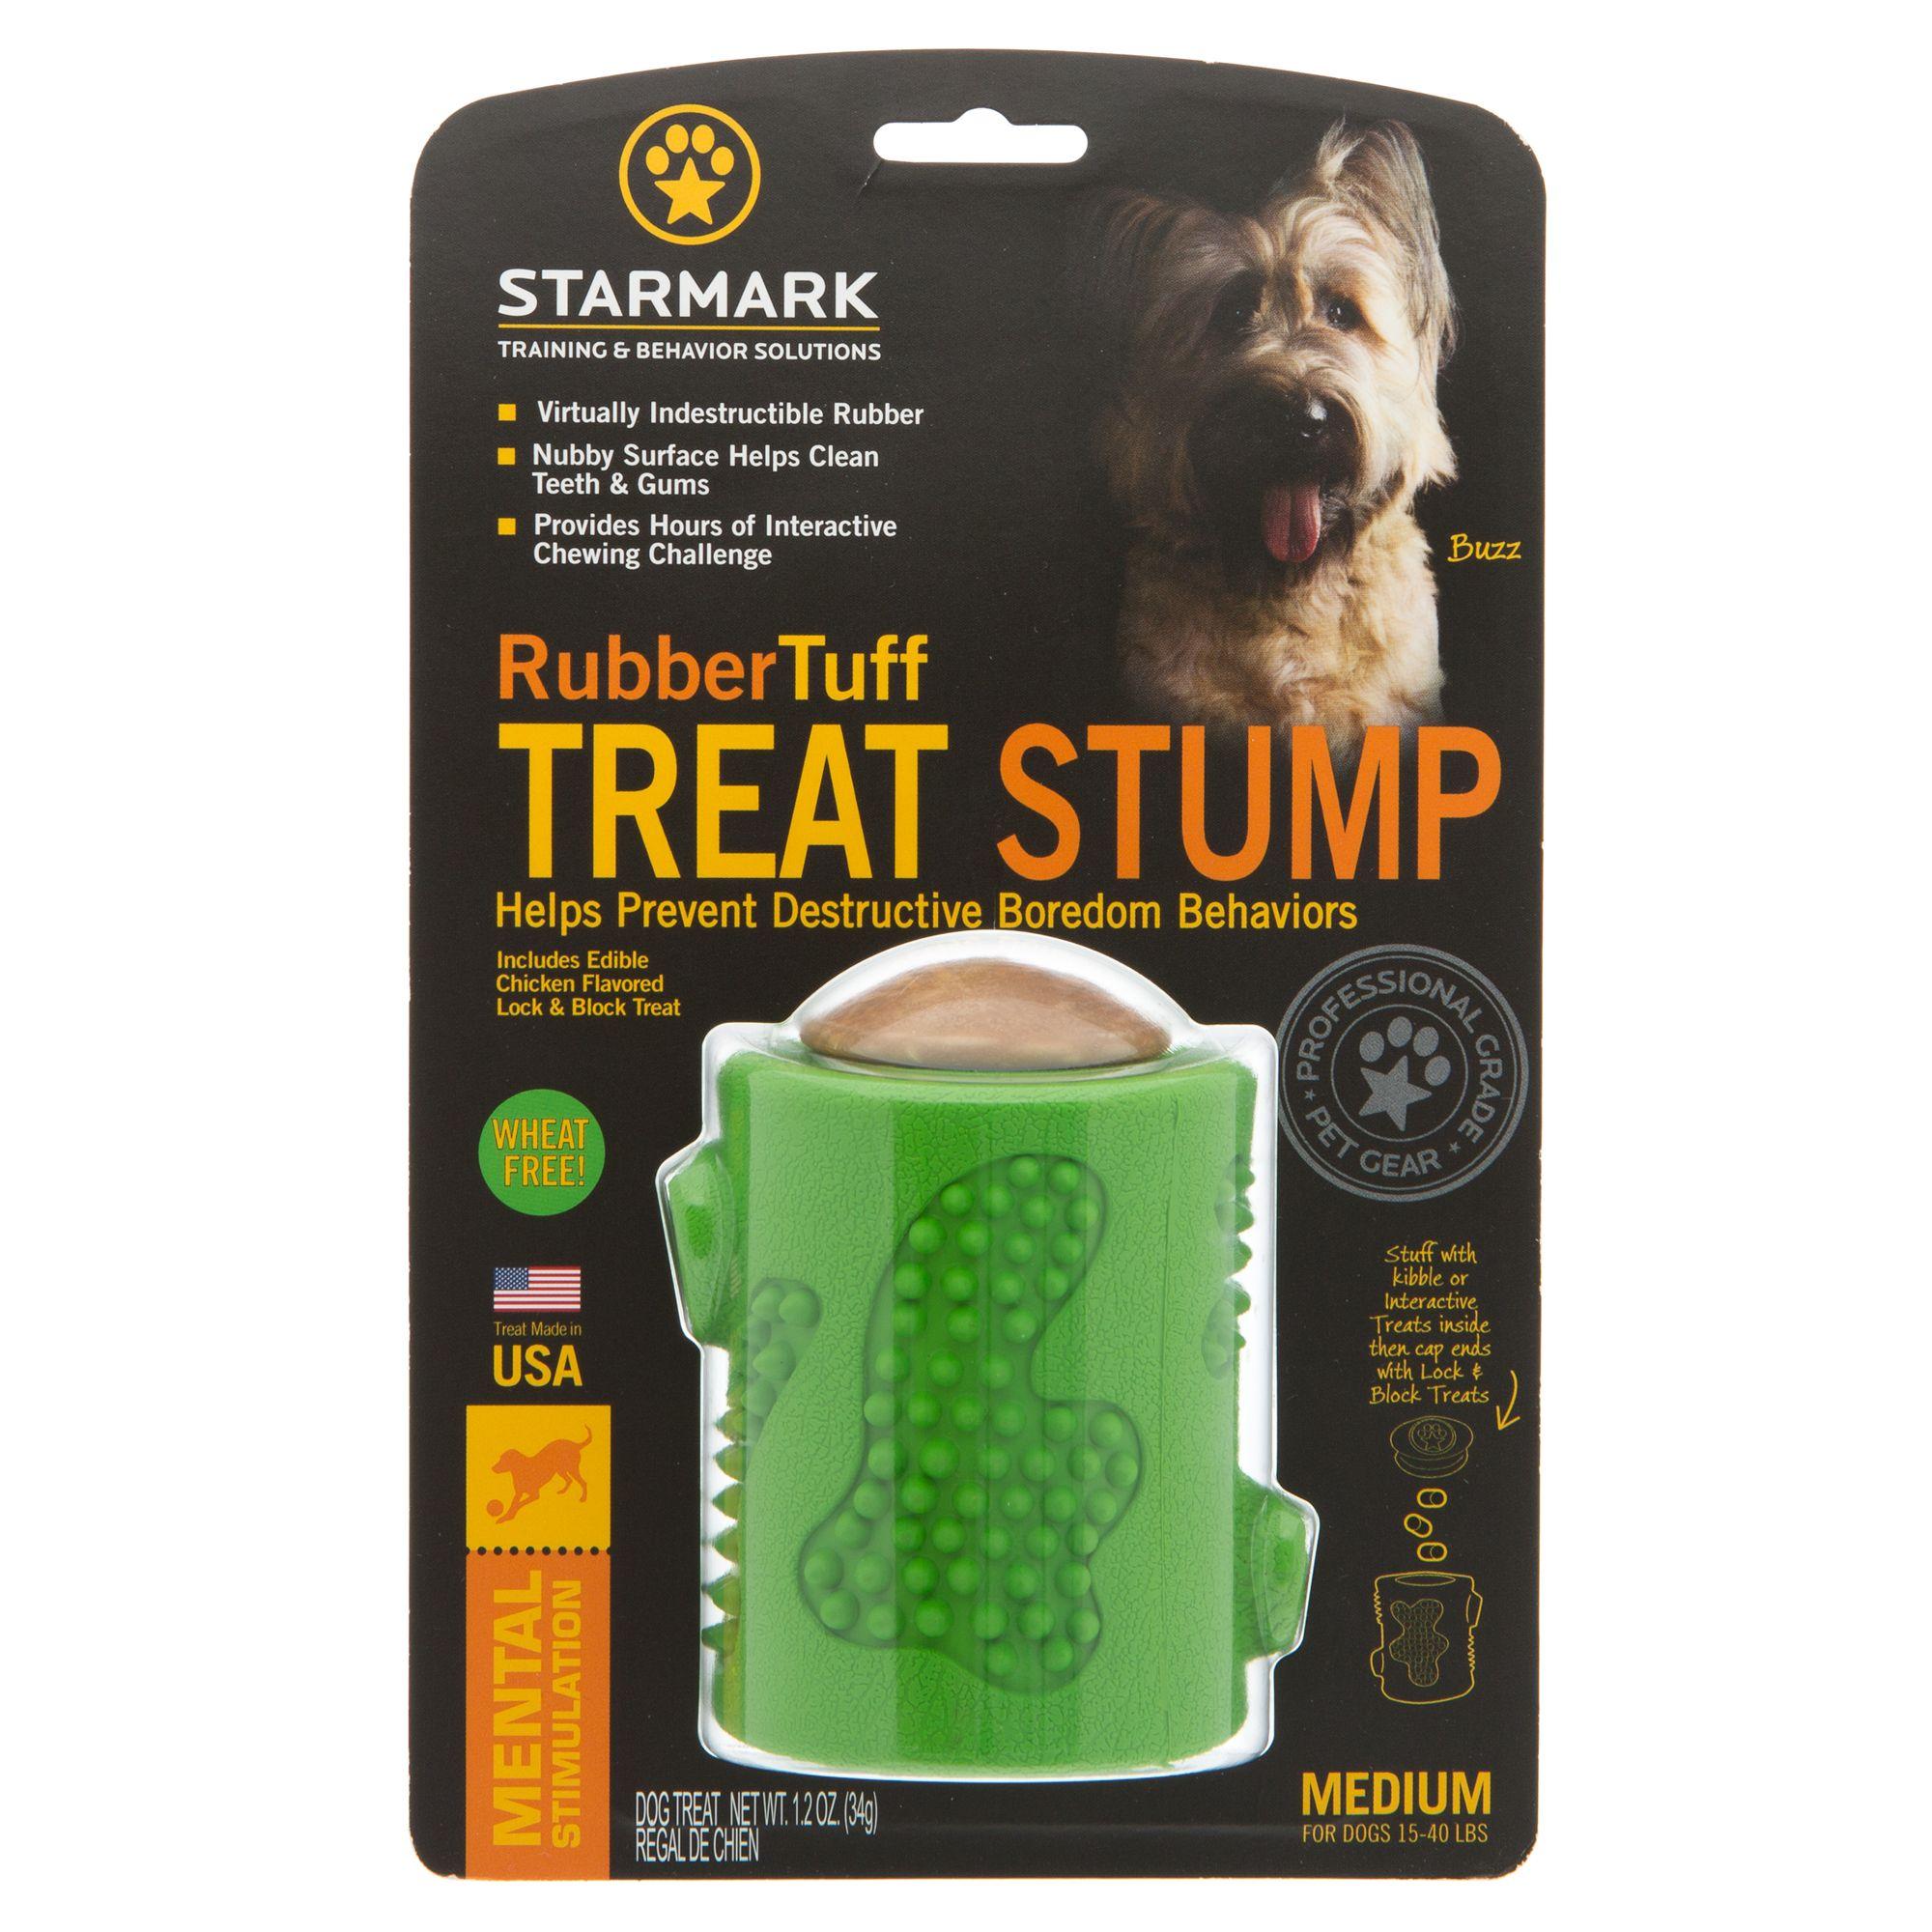 Starmark Rubber Tuff Stump Treat Dog Toy size: Medium, Chicken, Crunchy, Small Dogs Under 15 lbs, Rice Flour 5249086